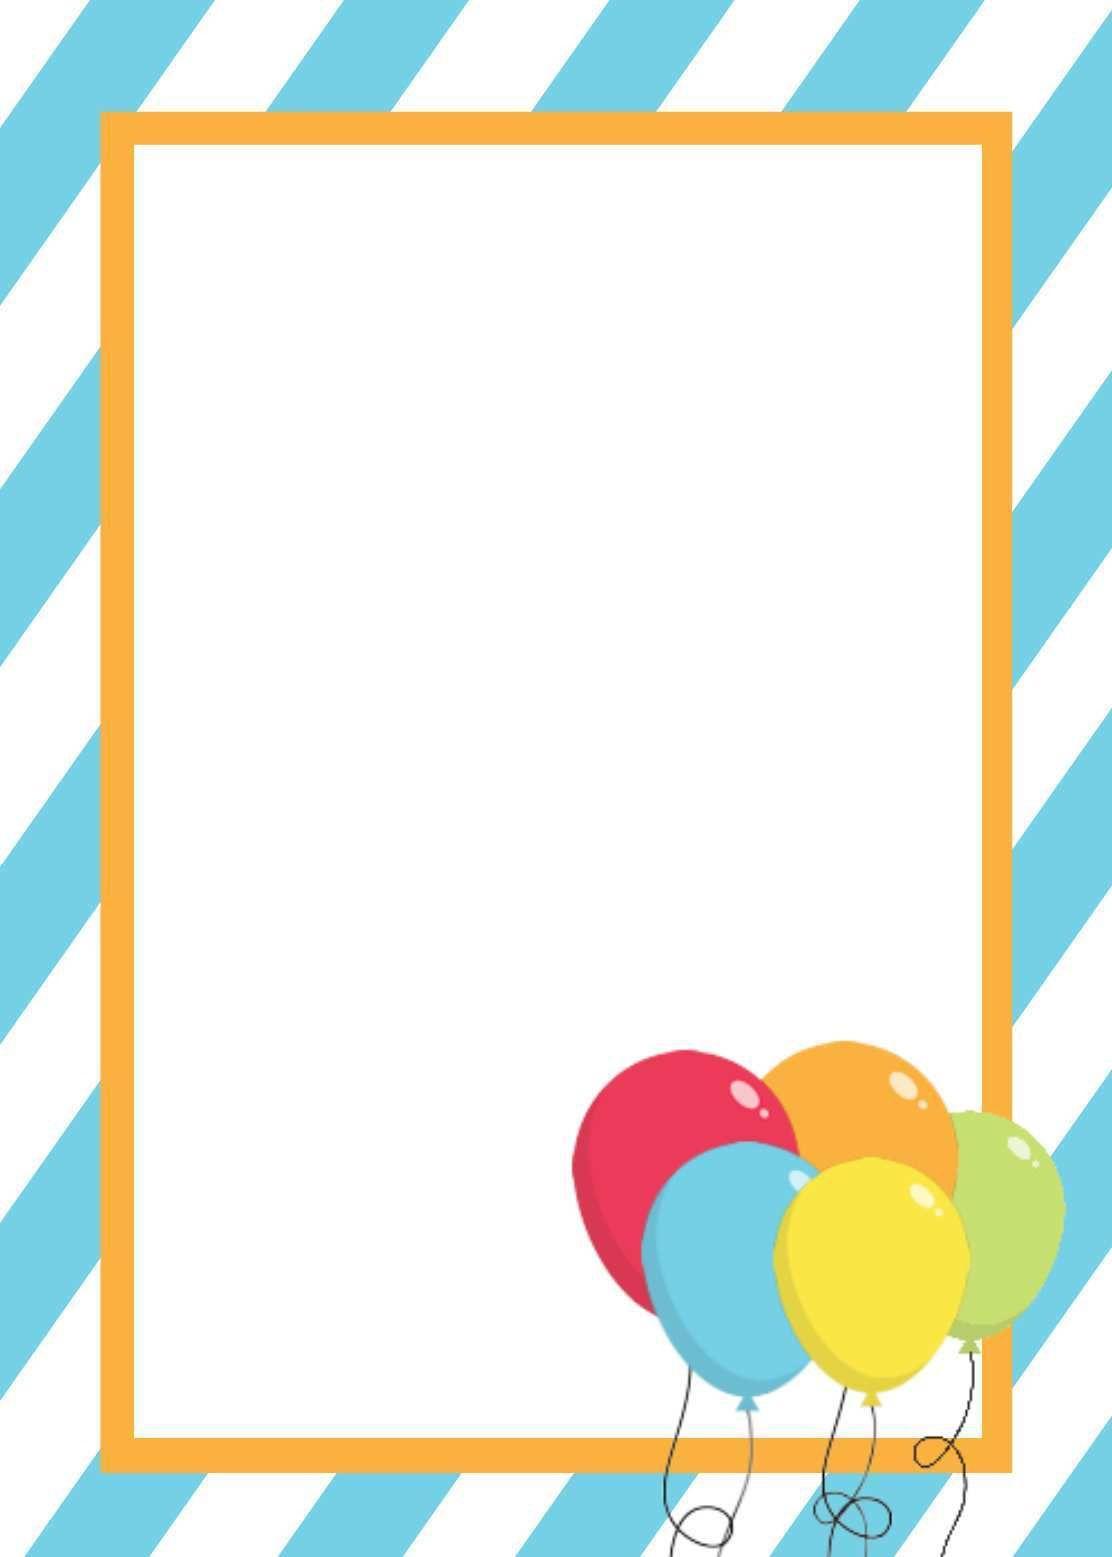 001 Breathtaking Party Invitation Template Word Design  Dinner Summer Wording Sample Unicorn BirthdayFull